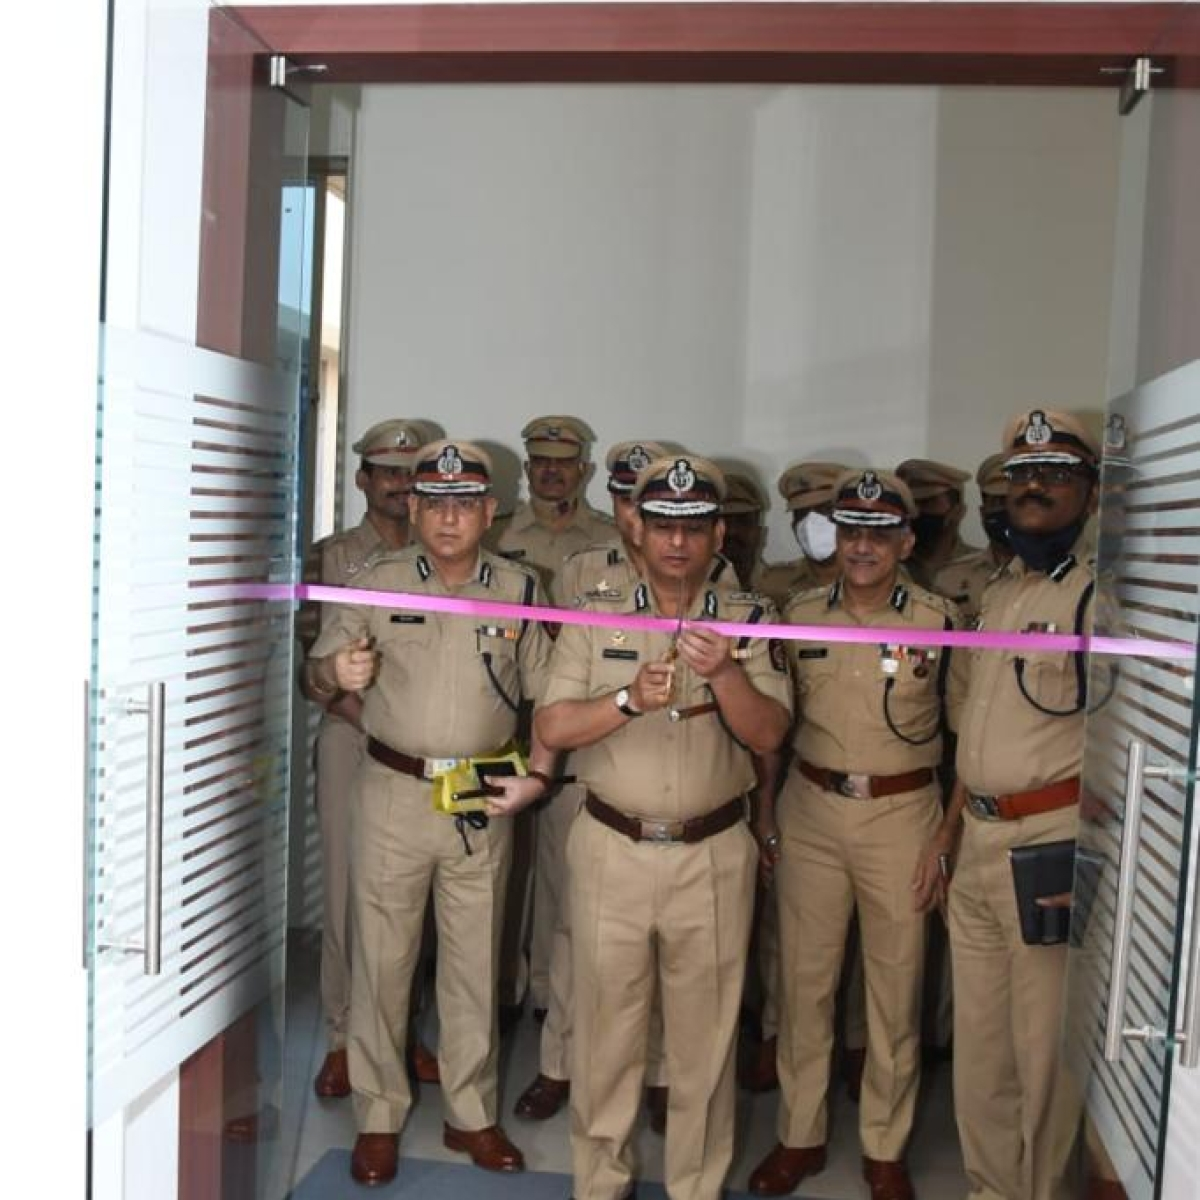 Maha DGP Hemant Nagrale inaugurates MBVV's control room in Mira Road